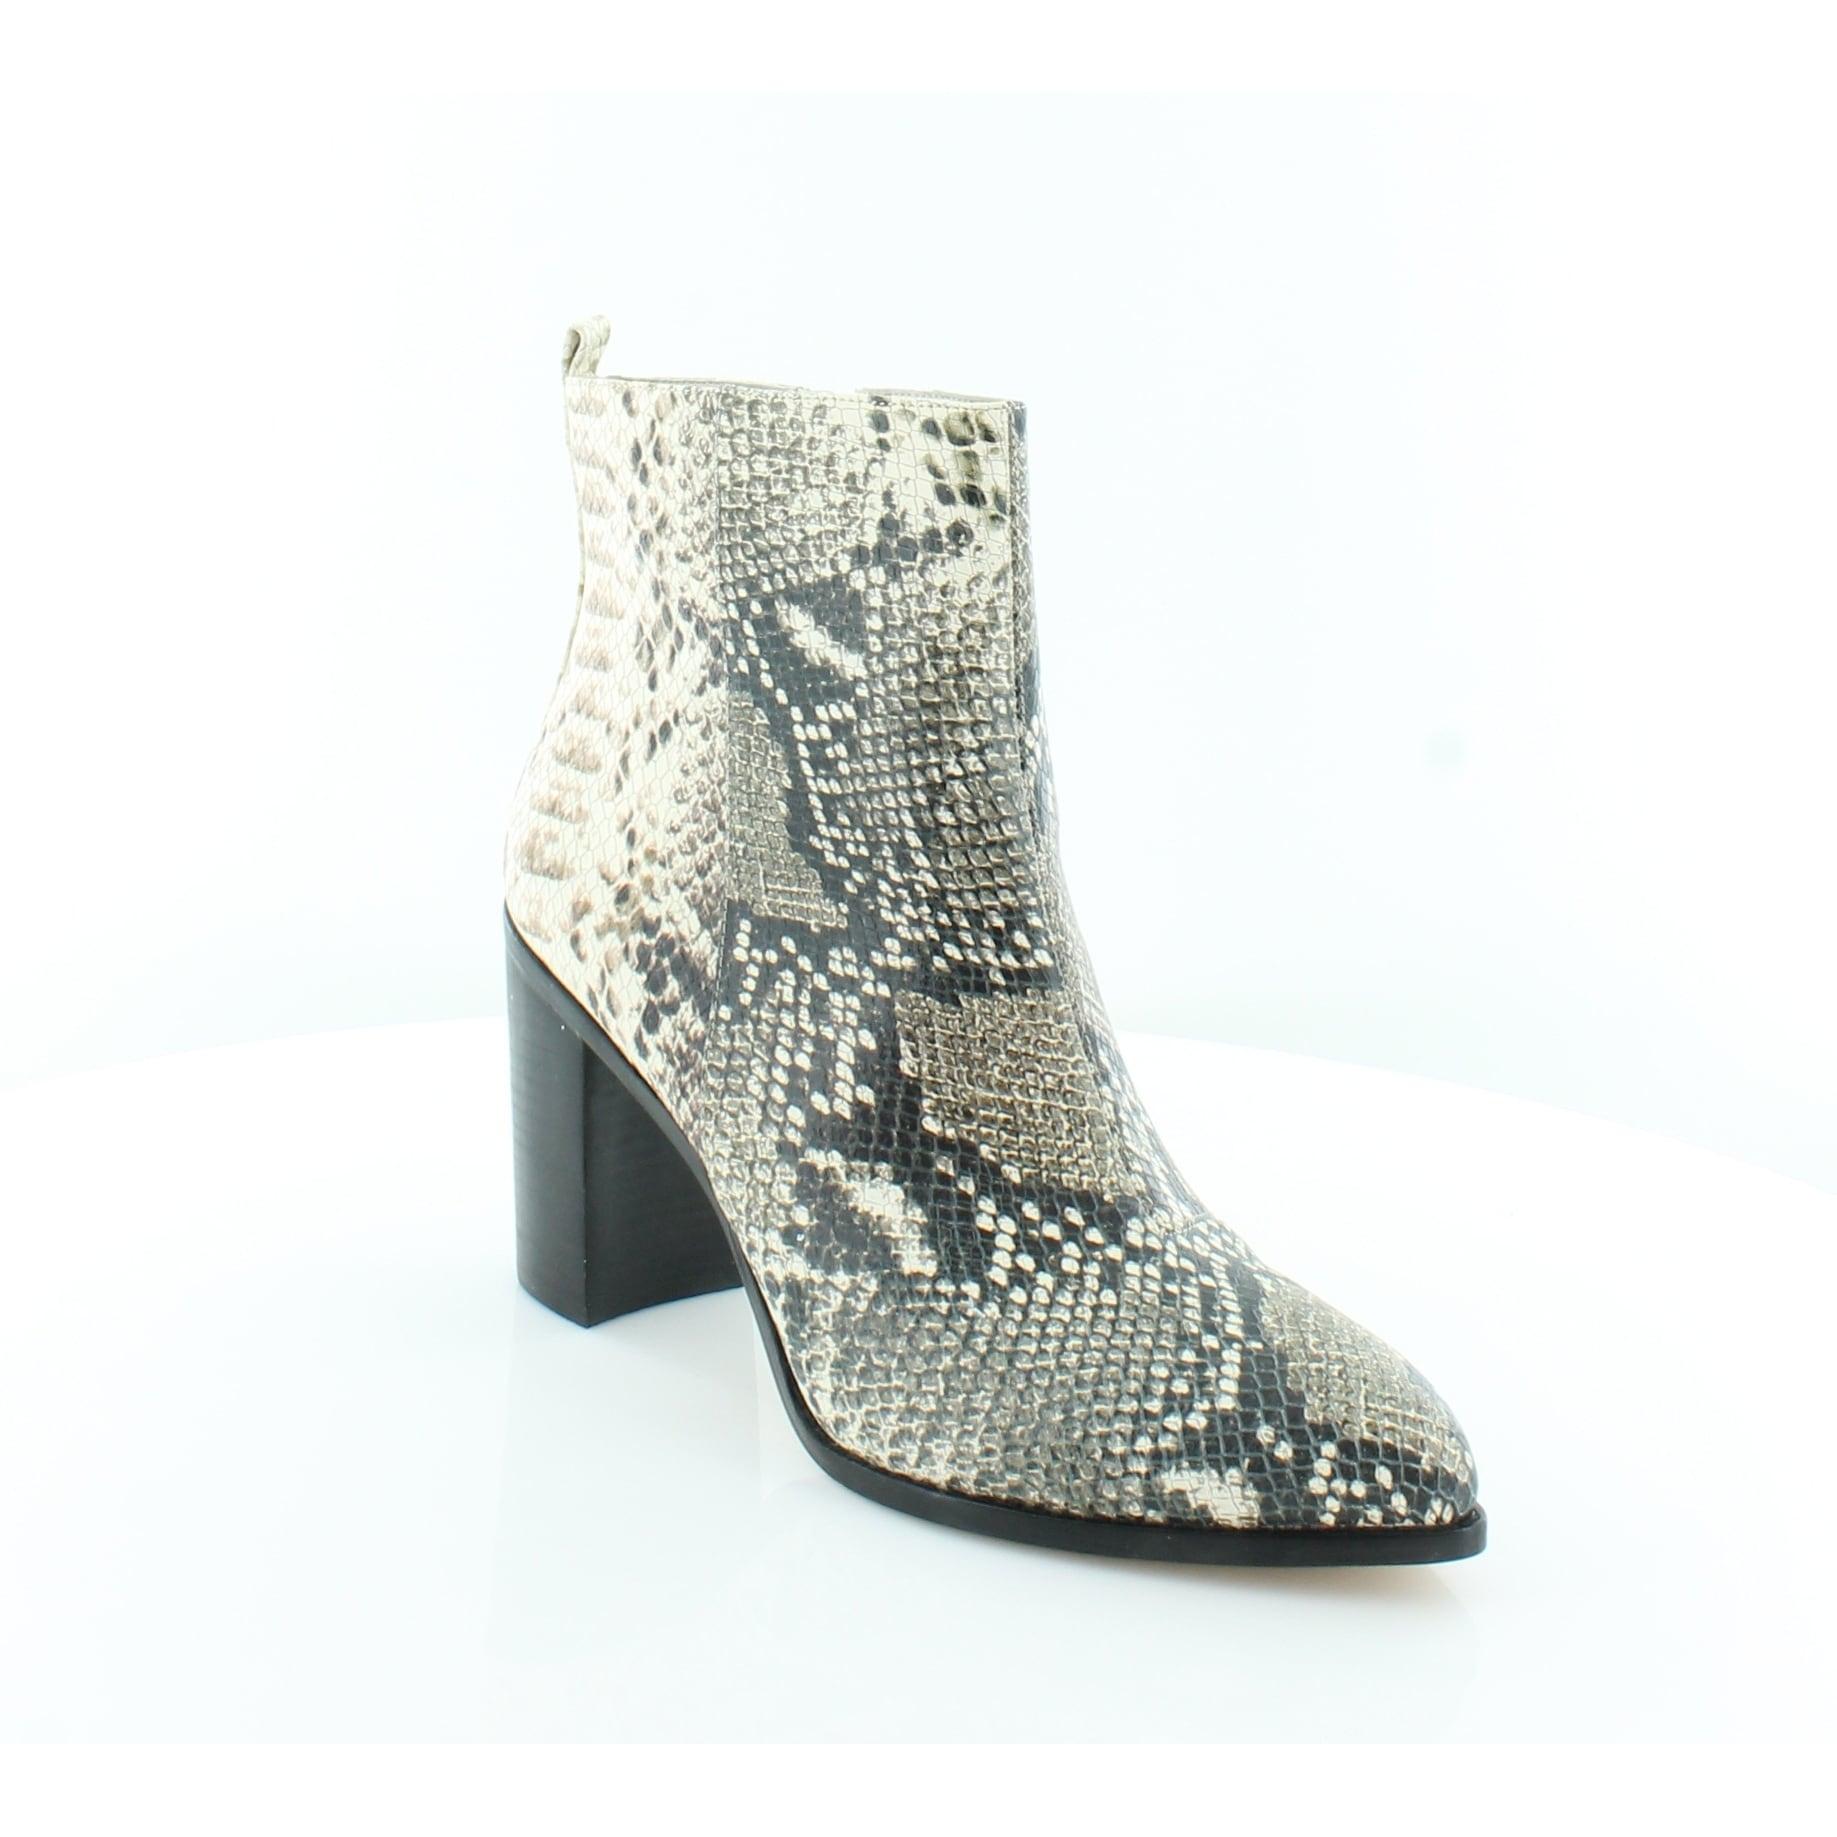 2f25464eff8 DKNY Houston Women's Boots Natural Nat - 10